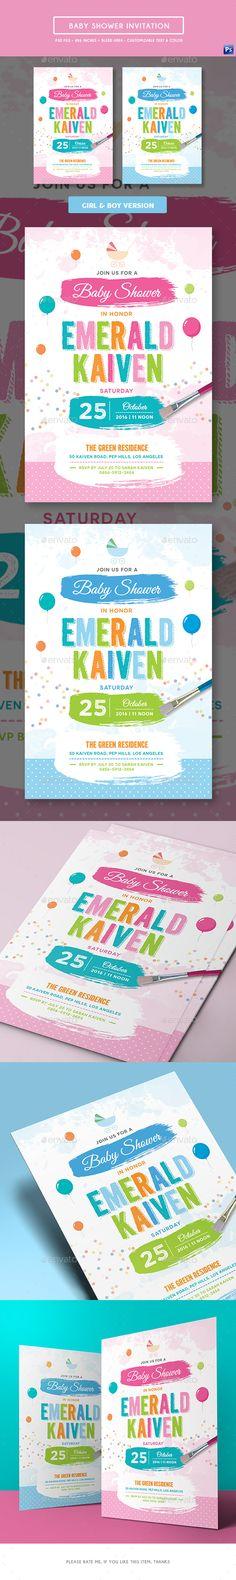 Baby Shower Invitation — Photoshop PSD #baby #birthday invitation • Available here → https://graphicriver.net/item/baby-shower-invitation/19464819?ref=pxcr